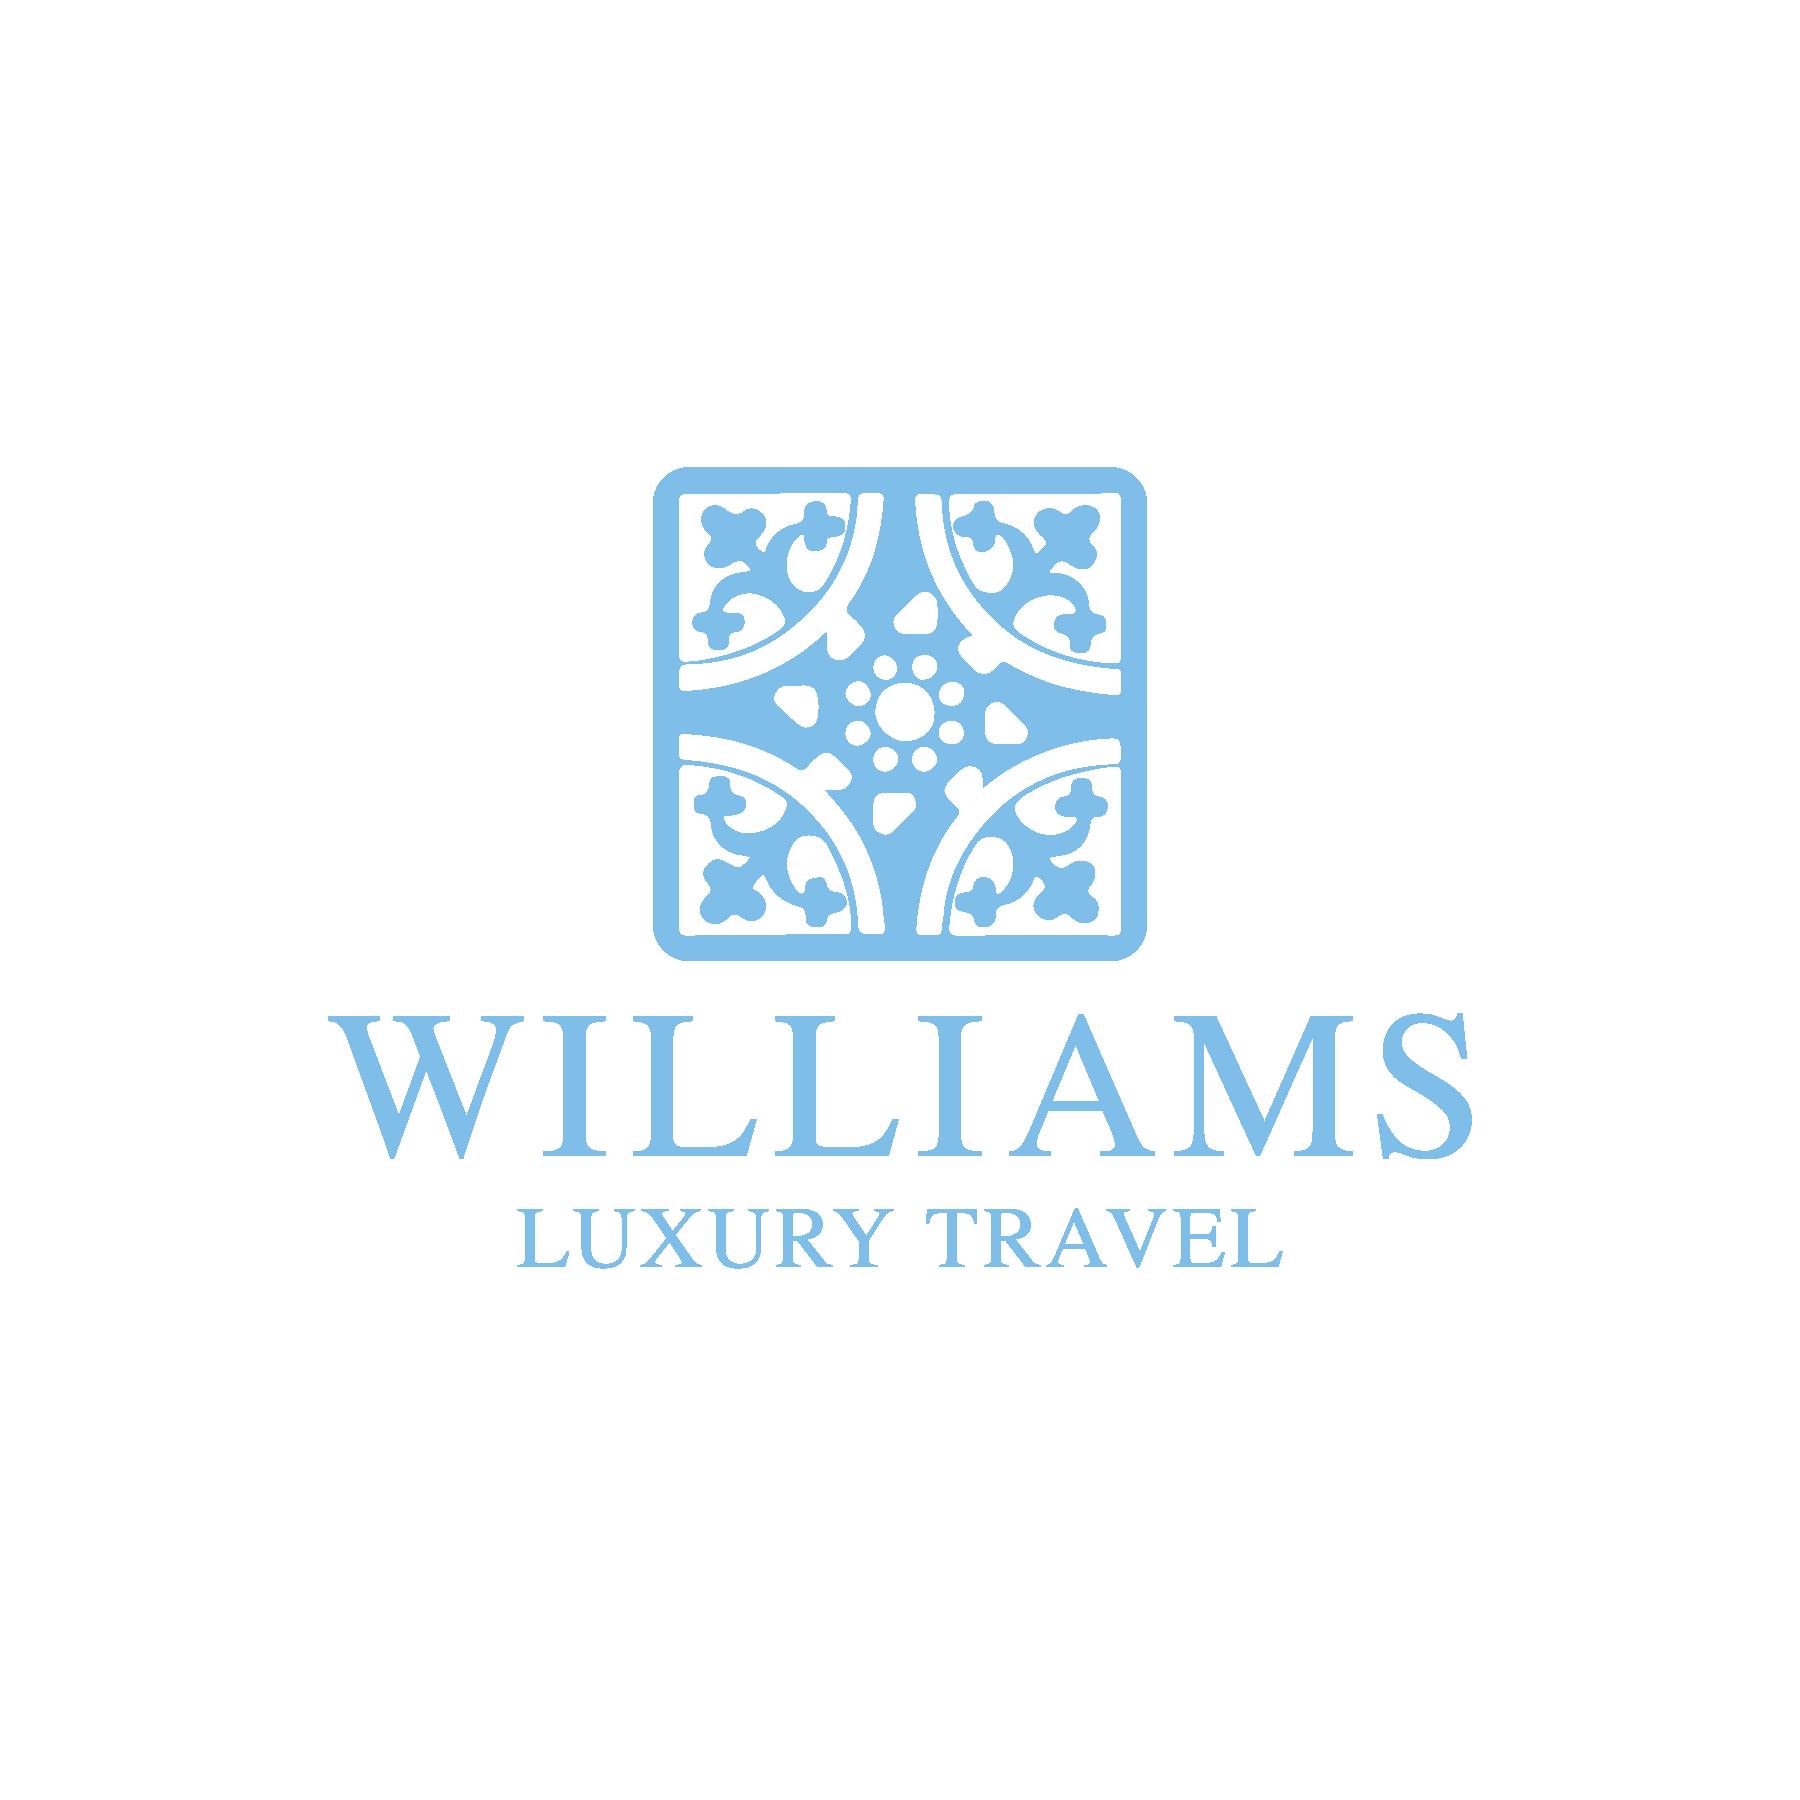 Williams Luxury Travel